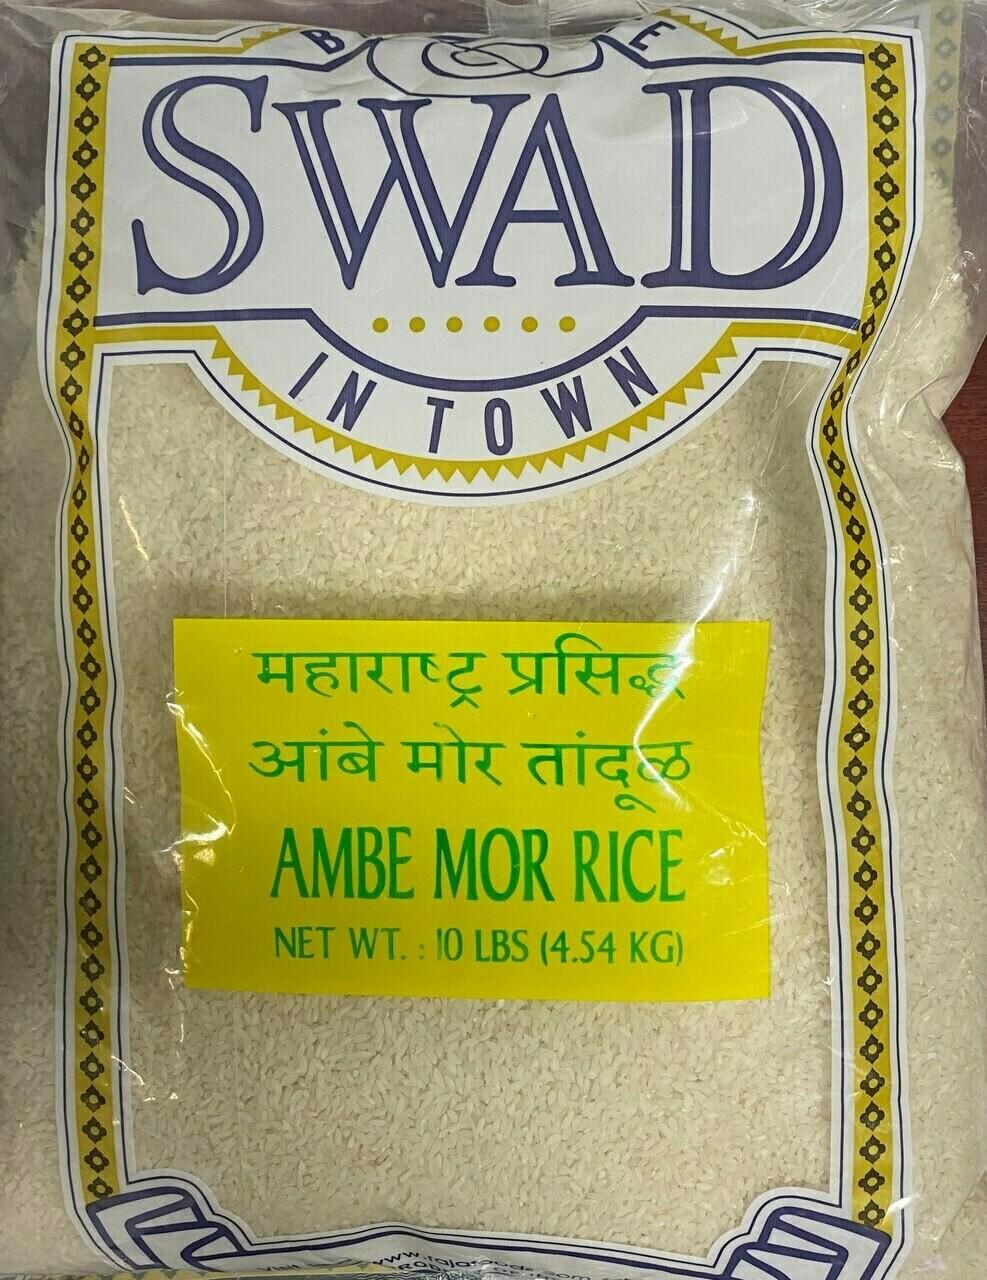 SWAD AMBE MOR RICE 10lb